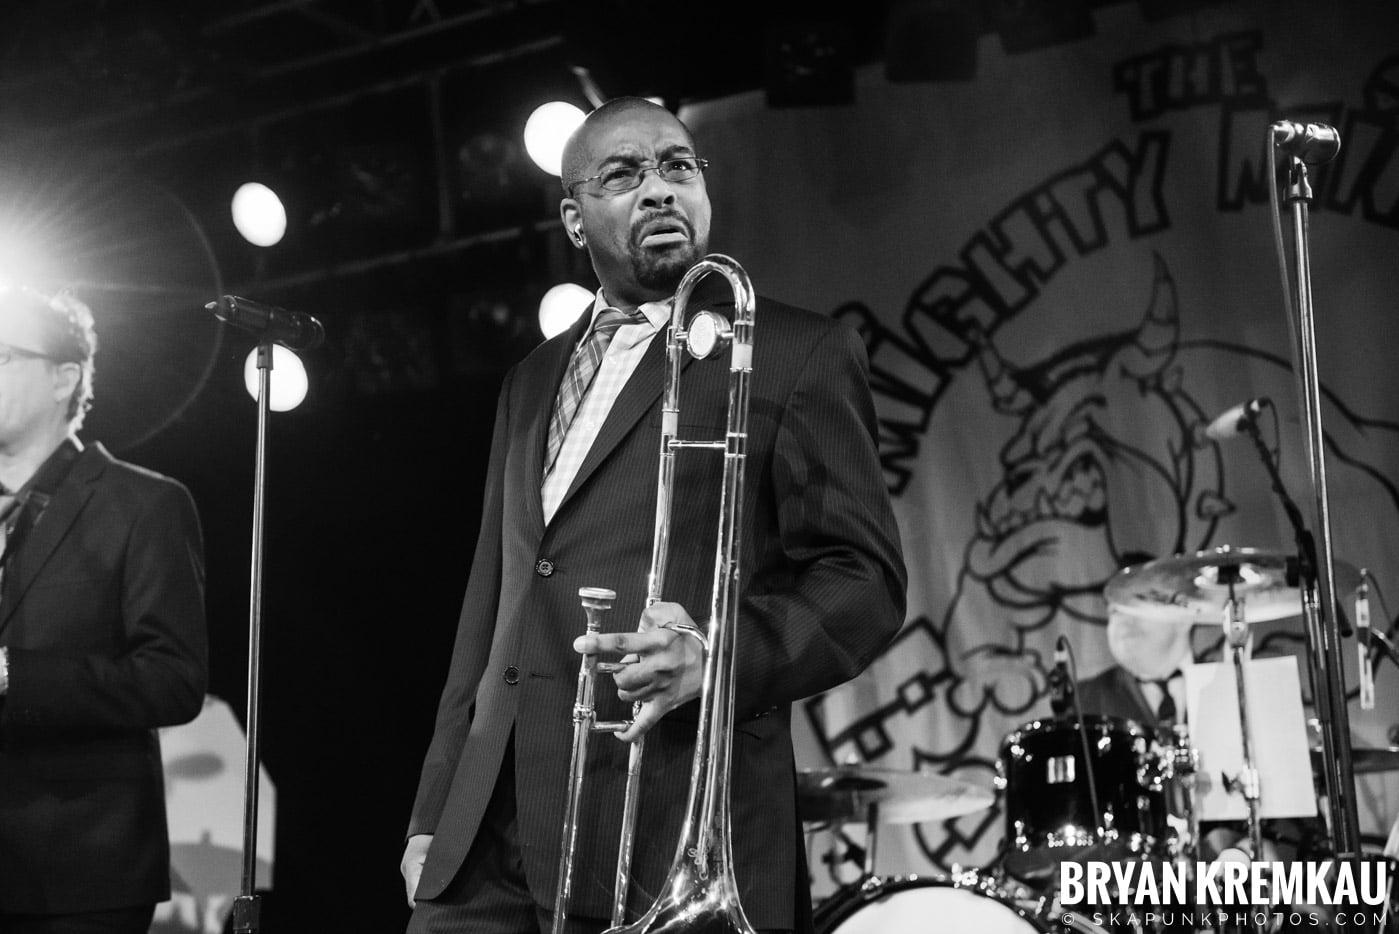 Mighty Mighty Bosstones @ Starland Ballroom, Sayreville, NJ - 7.29.17 (21)